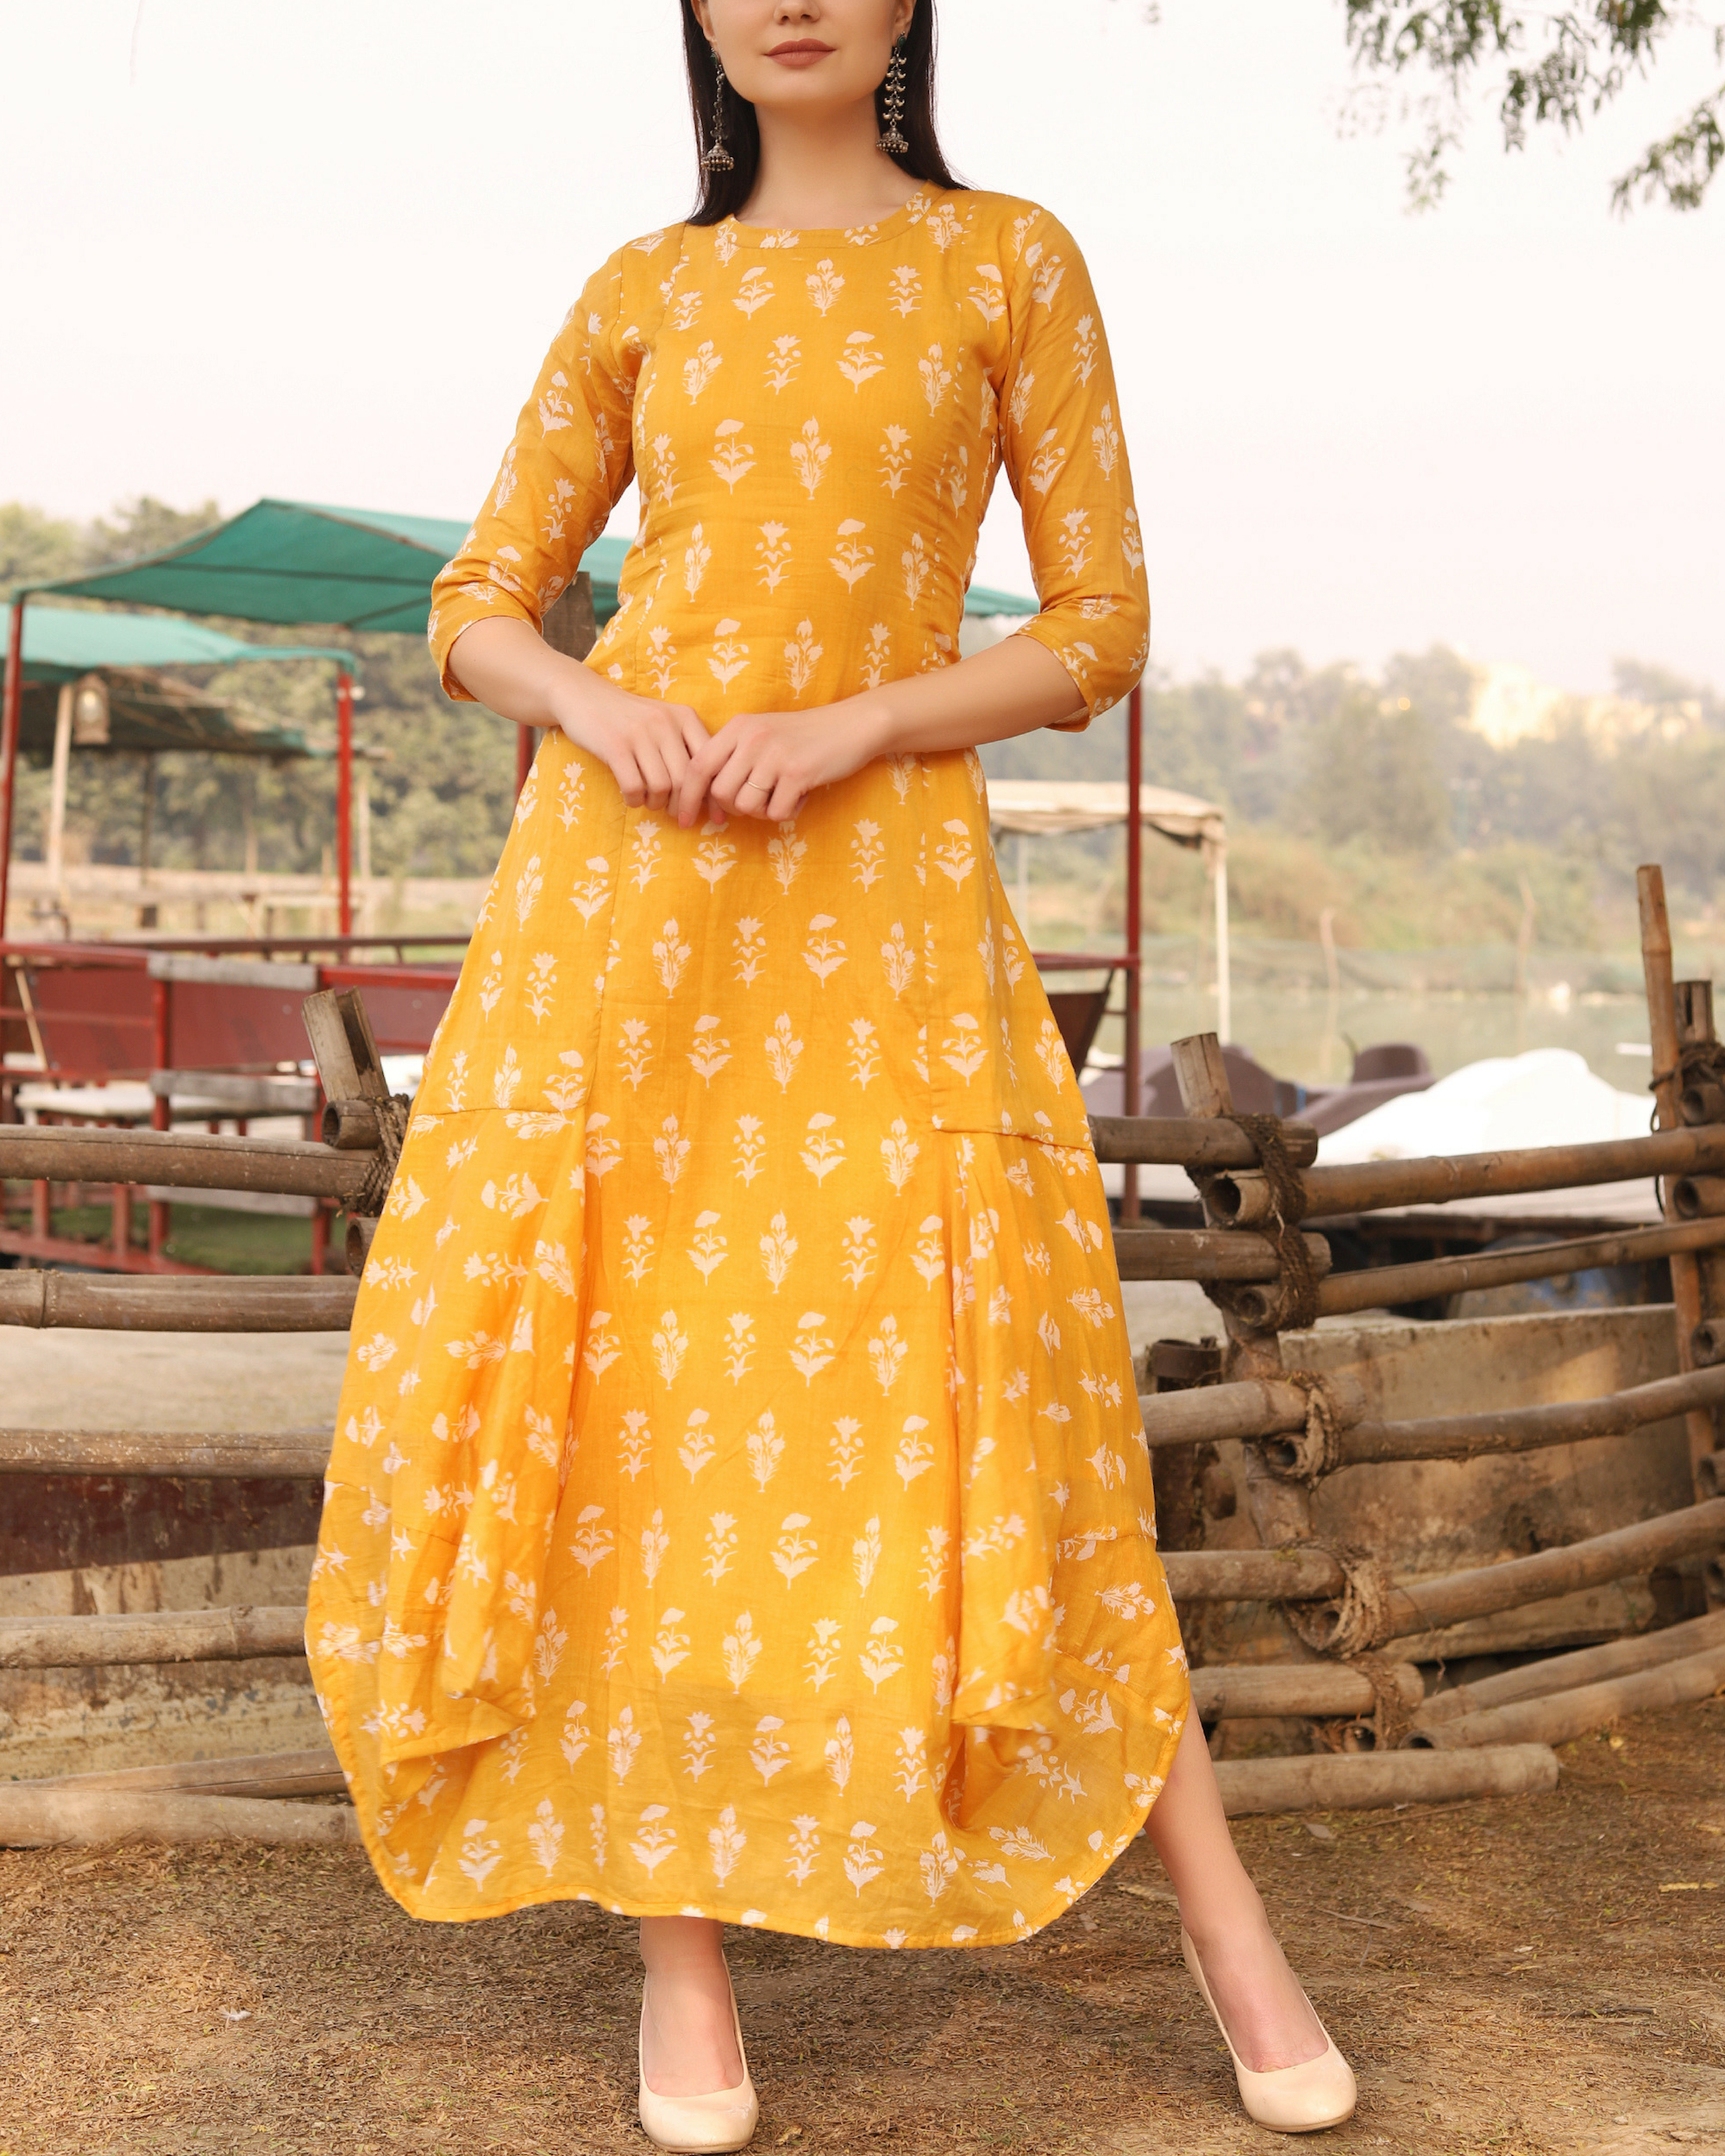 Breezy yellow dress